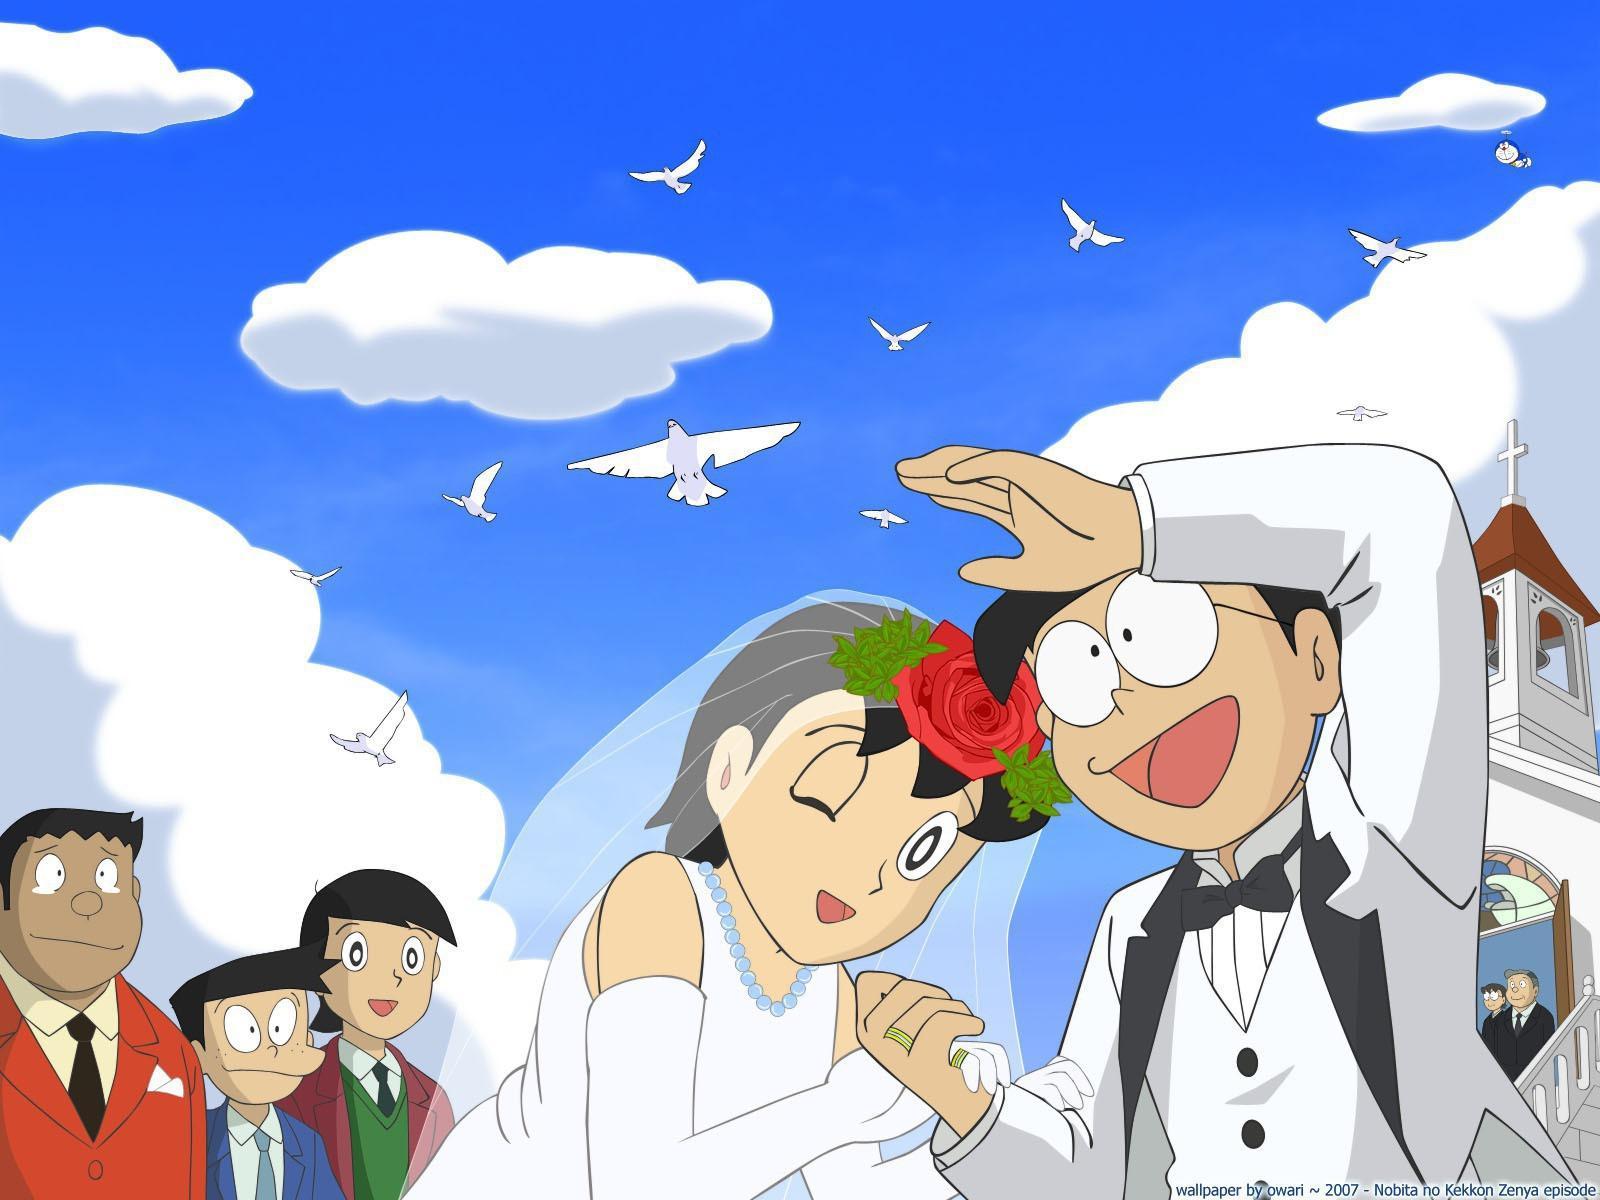 Nobita Shizuka Wedding   Wallpaper High Definition High Quality 1600x1200